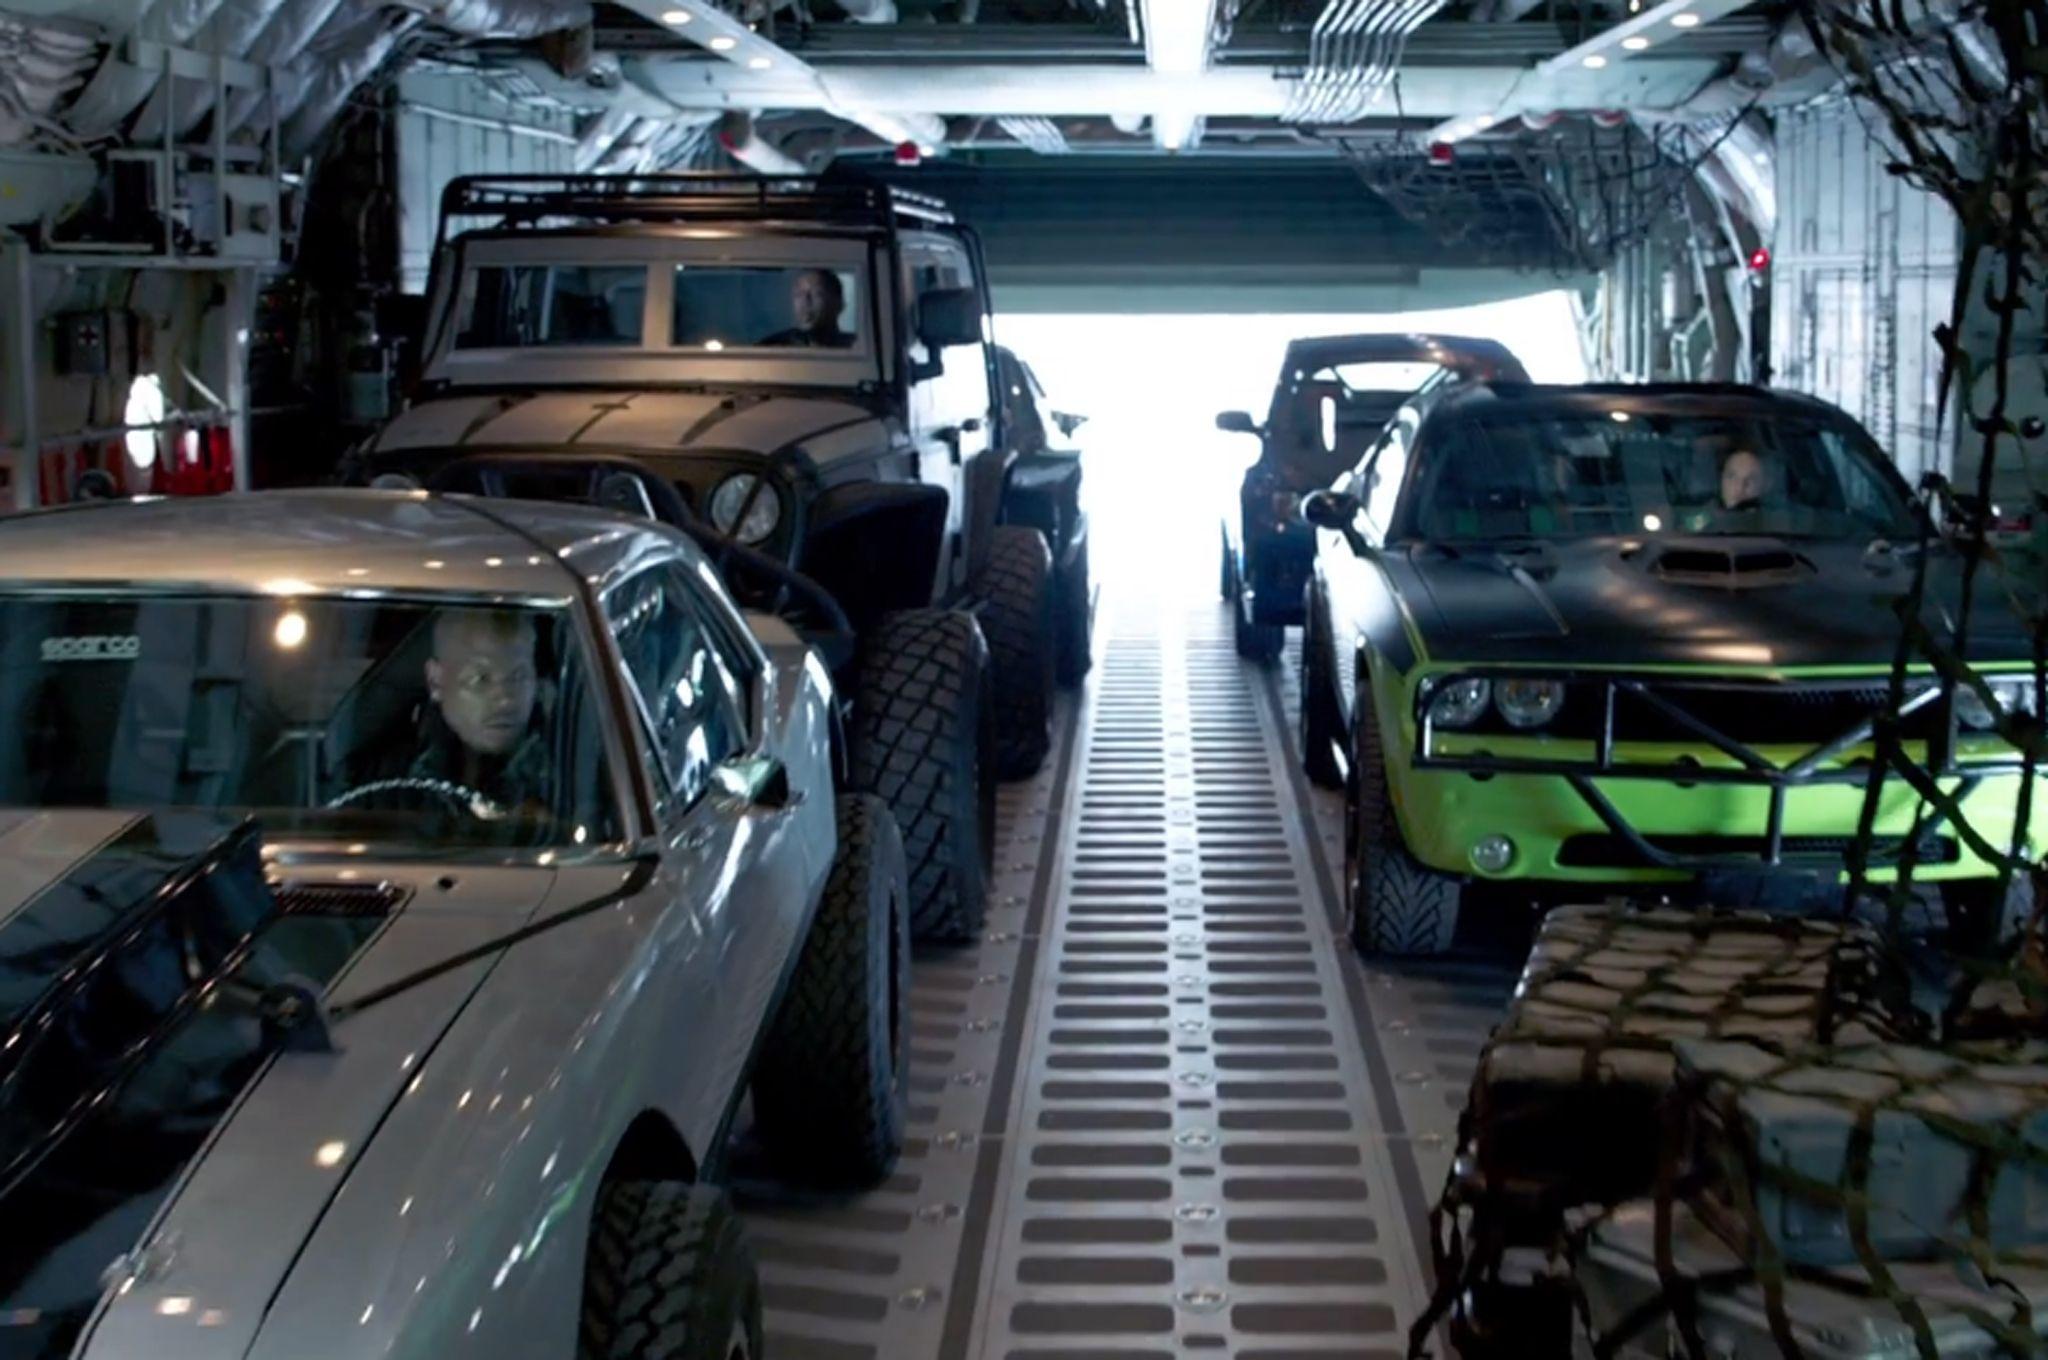 parachuting cars in furious 7 trailer screen shot - Fast And Furious 7 Cars